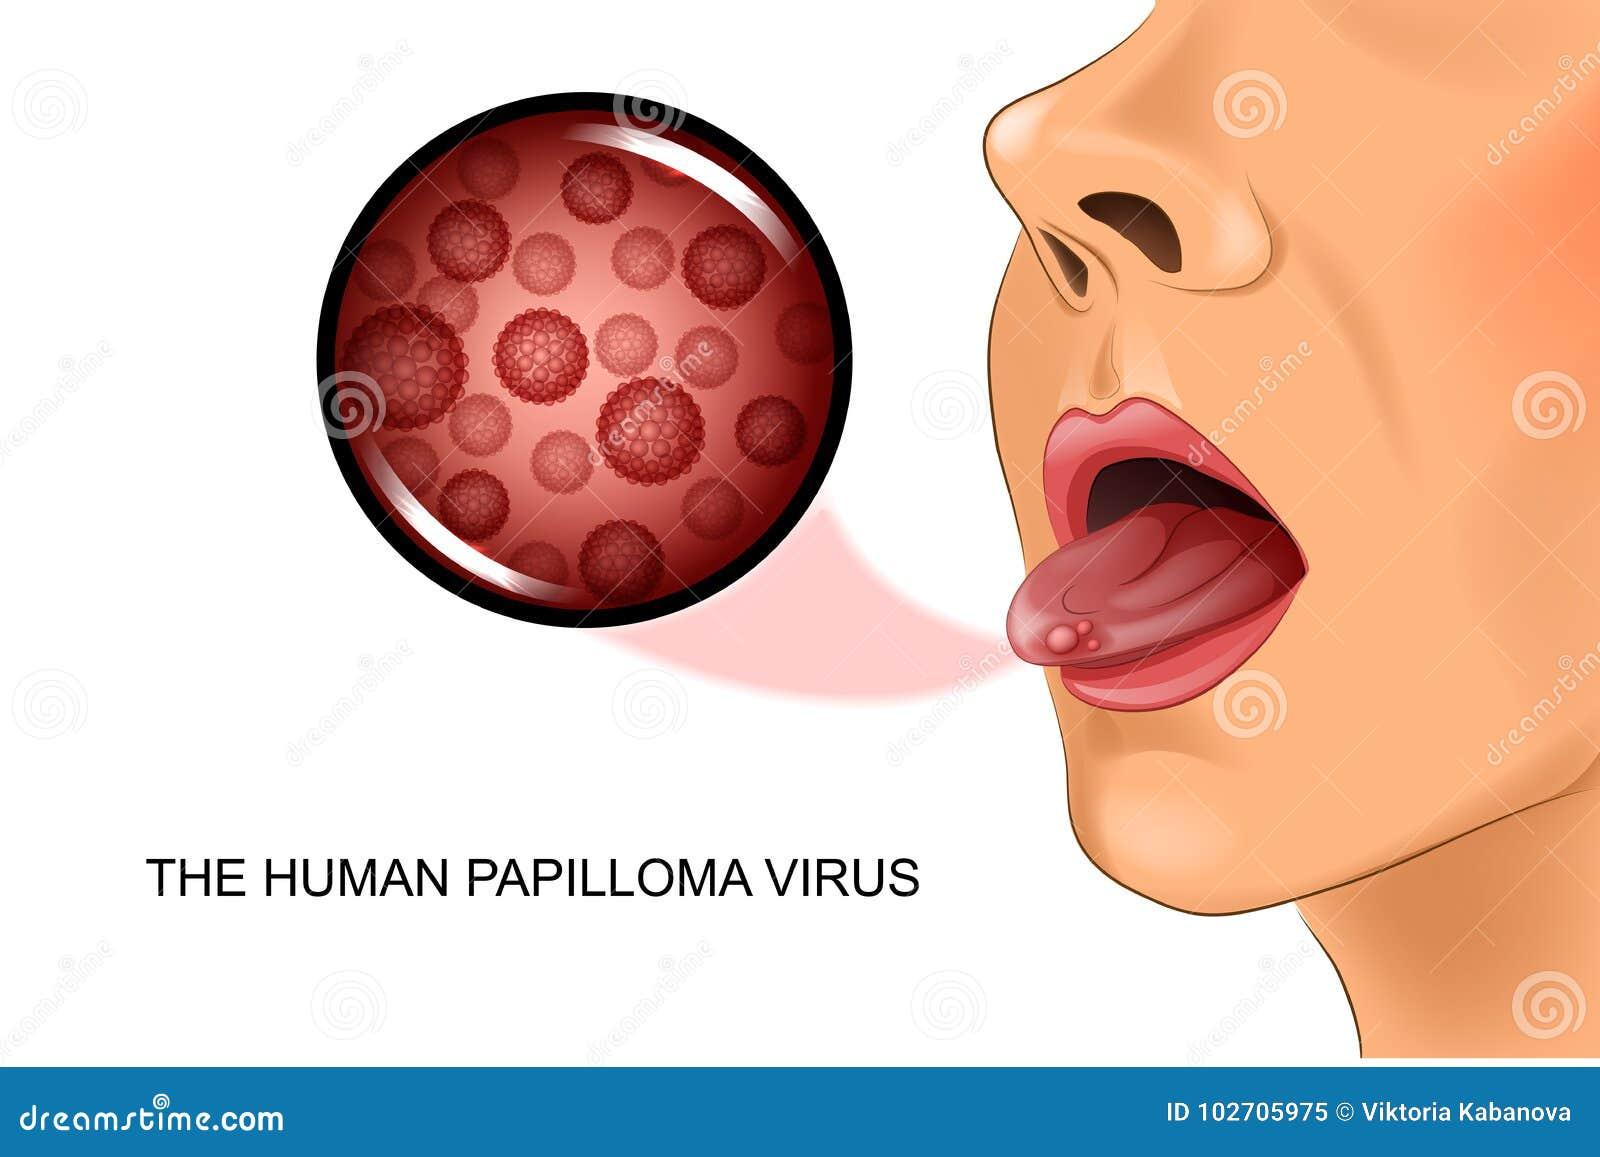 que es la cancer de prostata intraductal papilloma breast pain